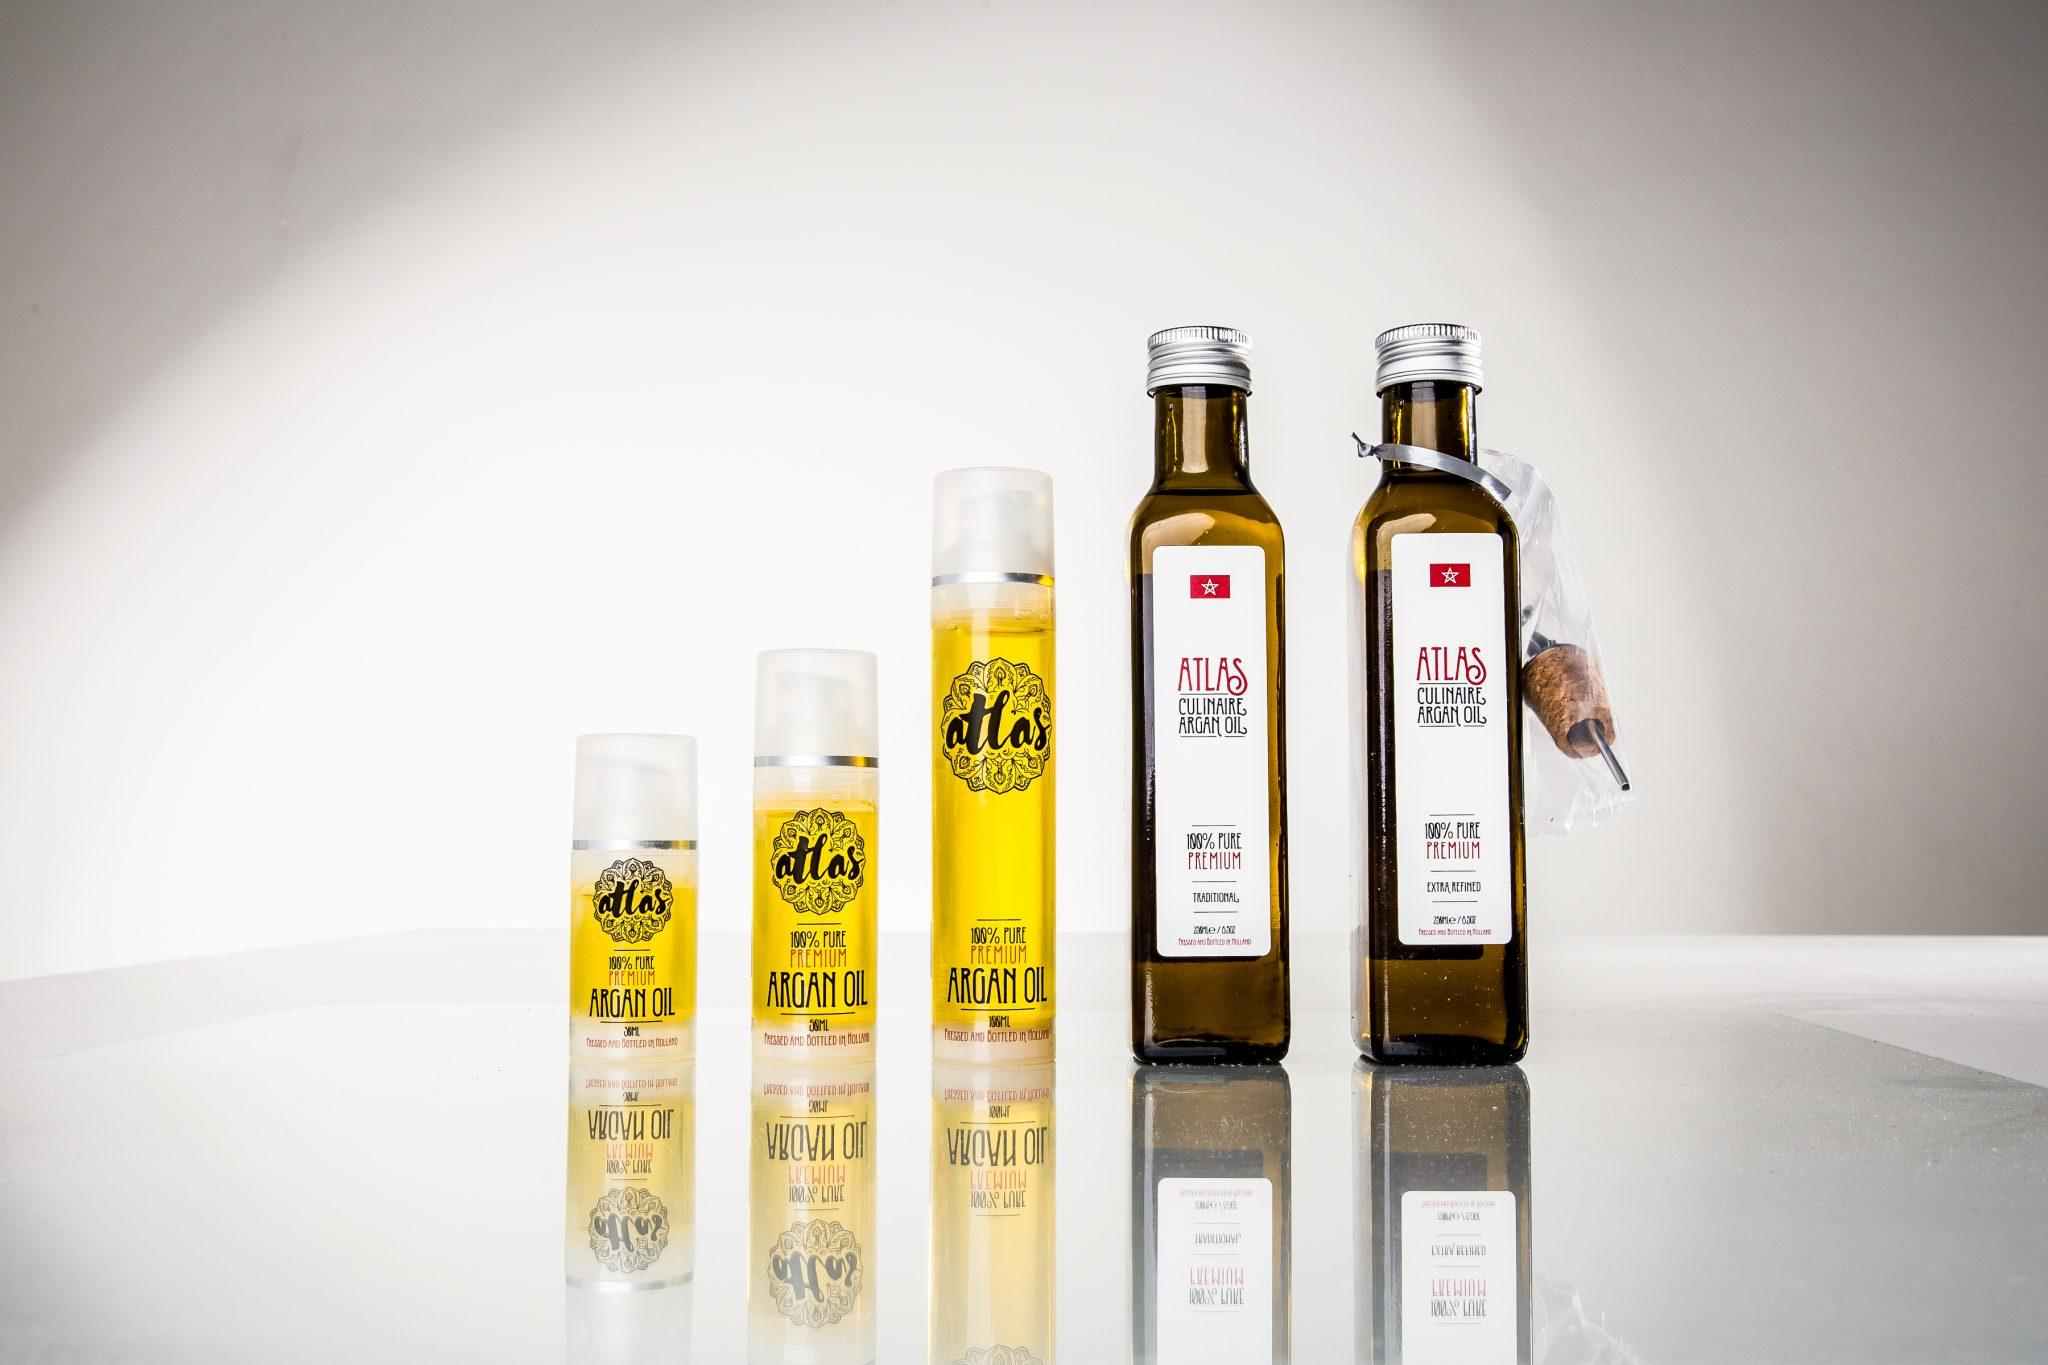 Argan olie assortiment